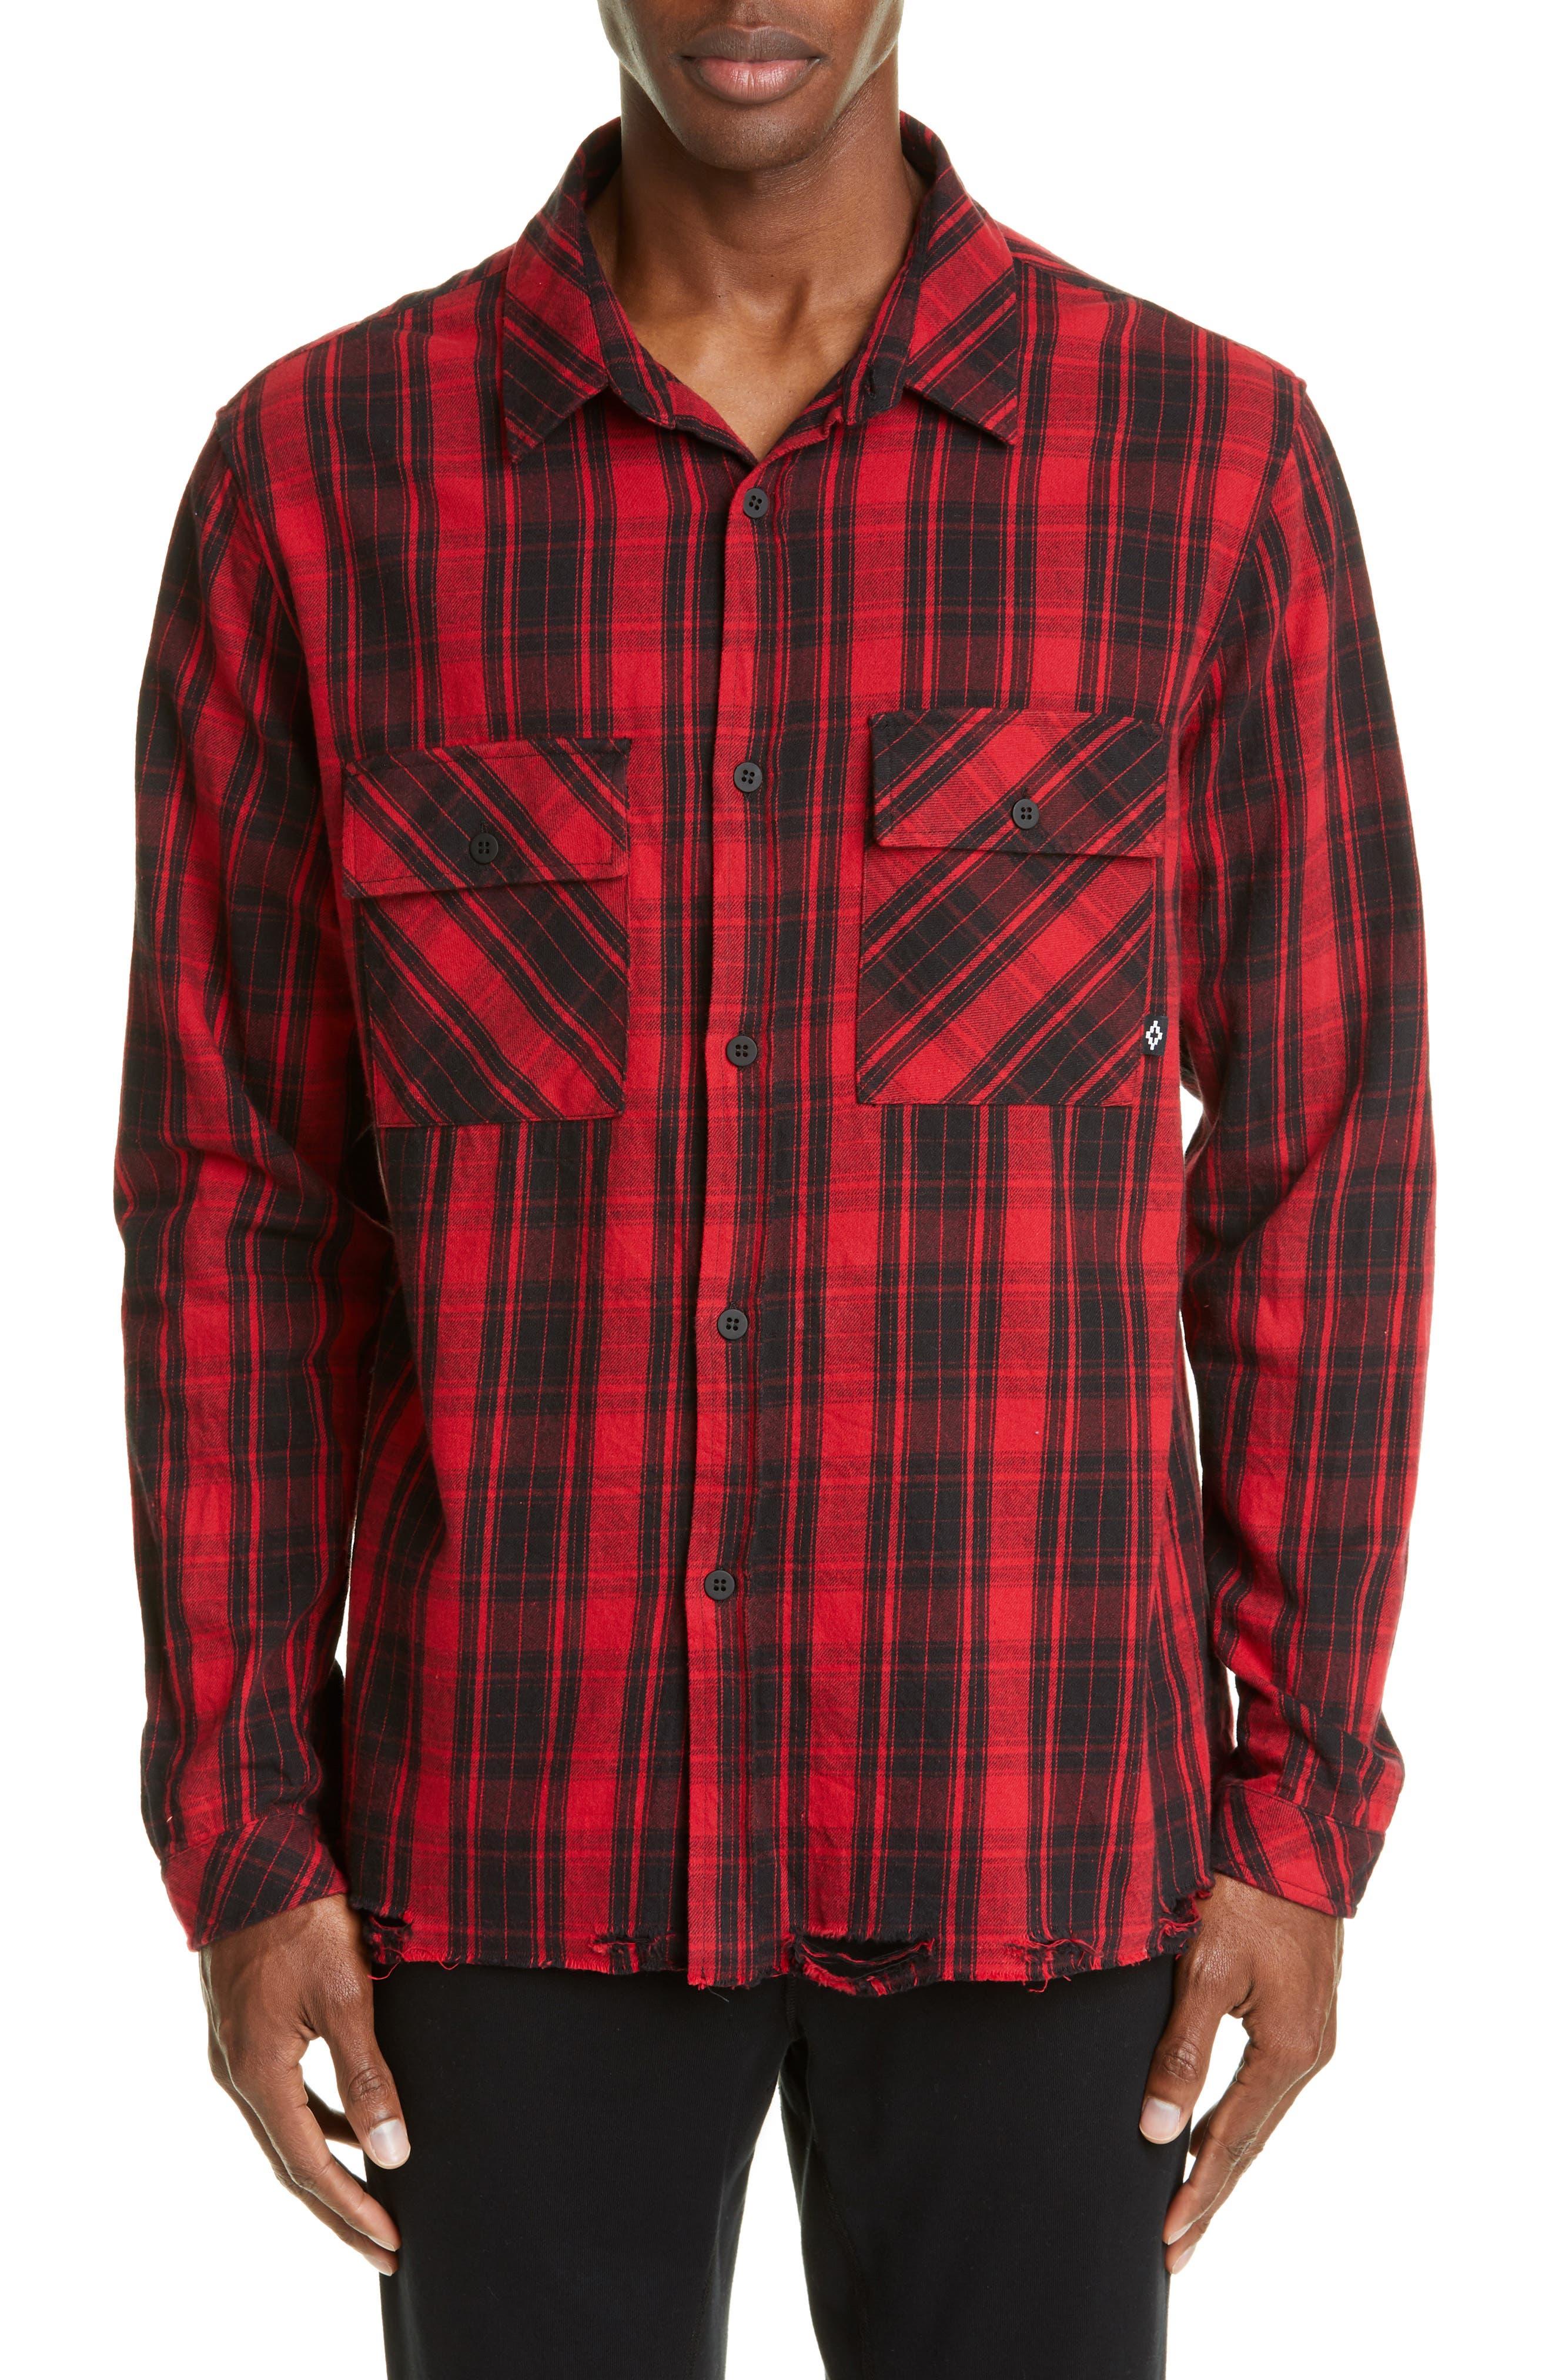 Marcelo Burlon County Check Plaid Button-Up Flannel Shirt, Red